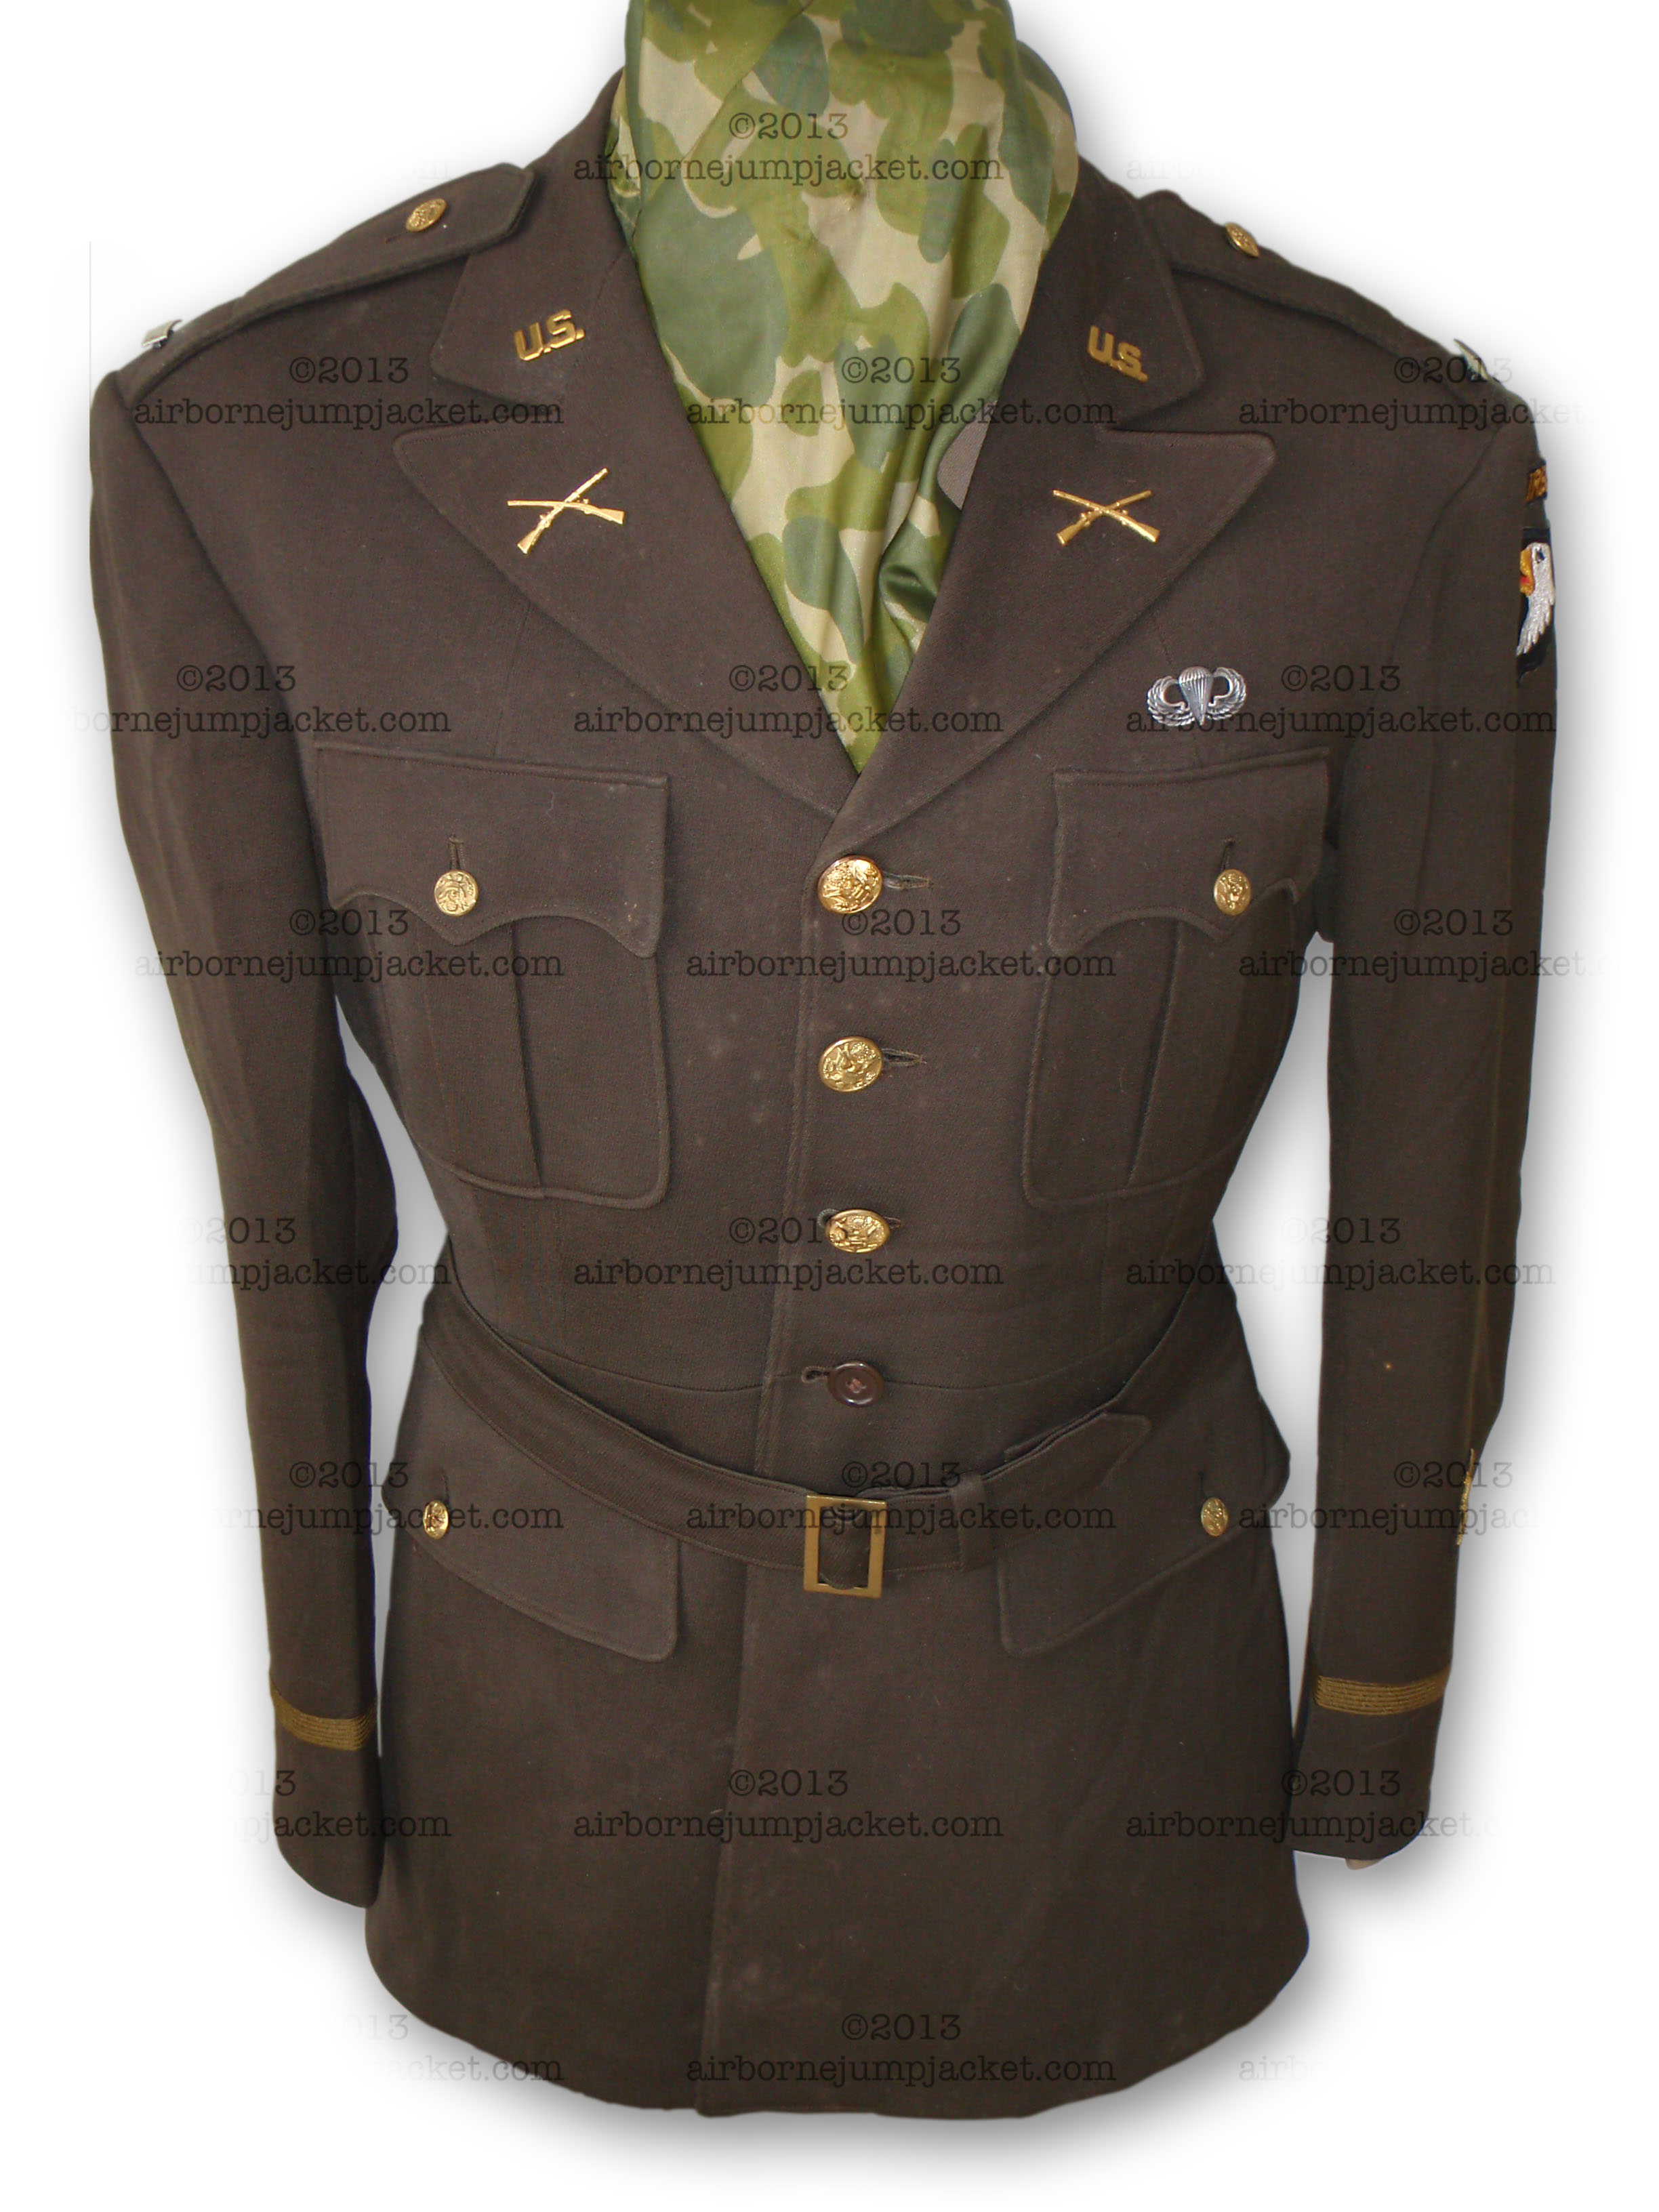 Airborne Dress Uniform 80